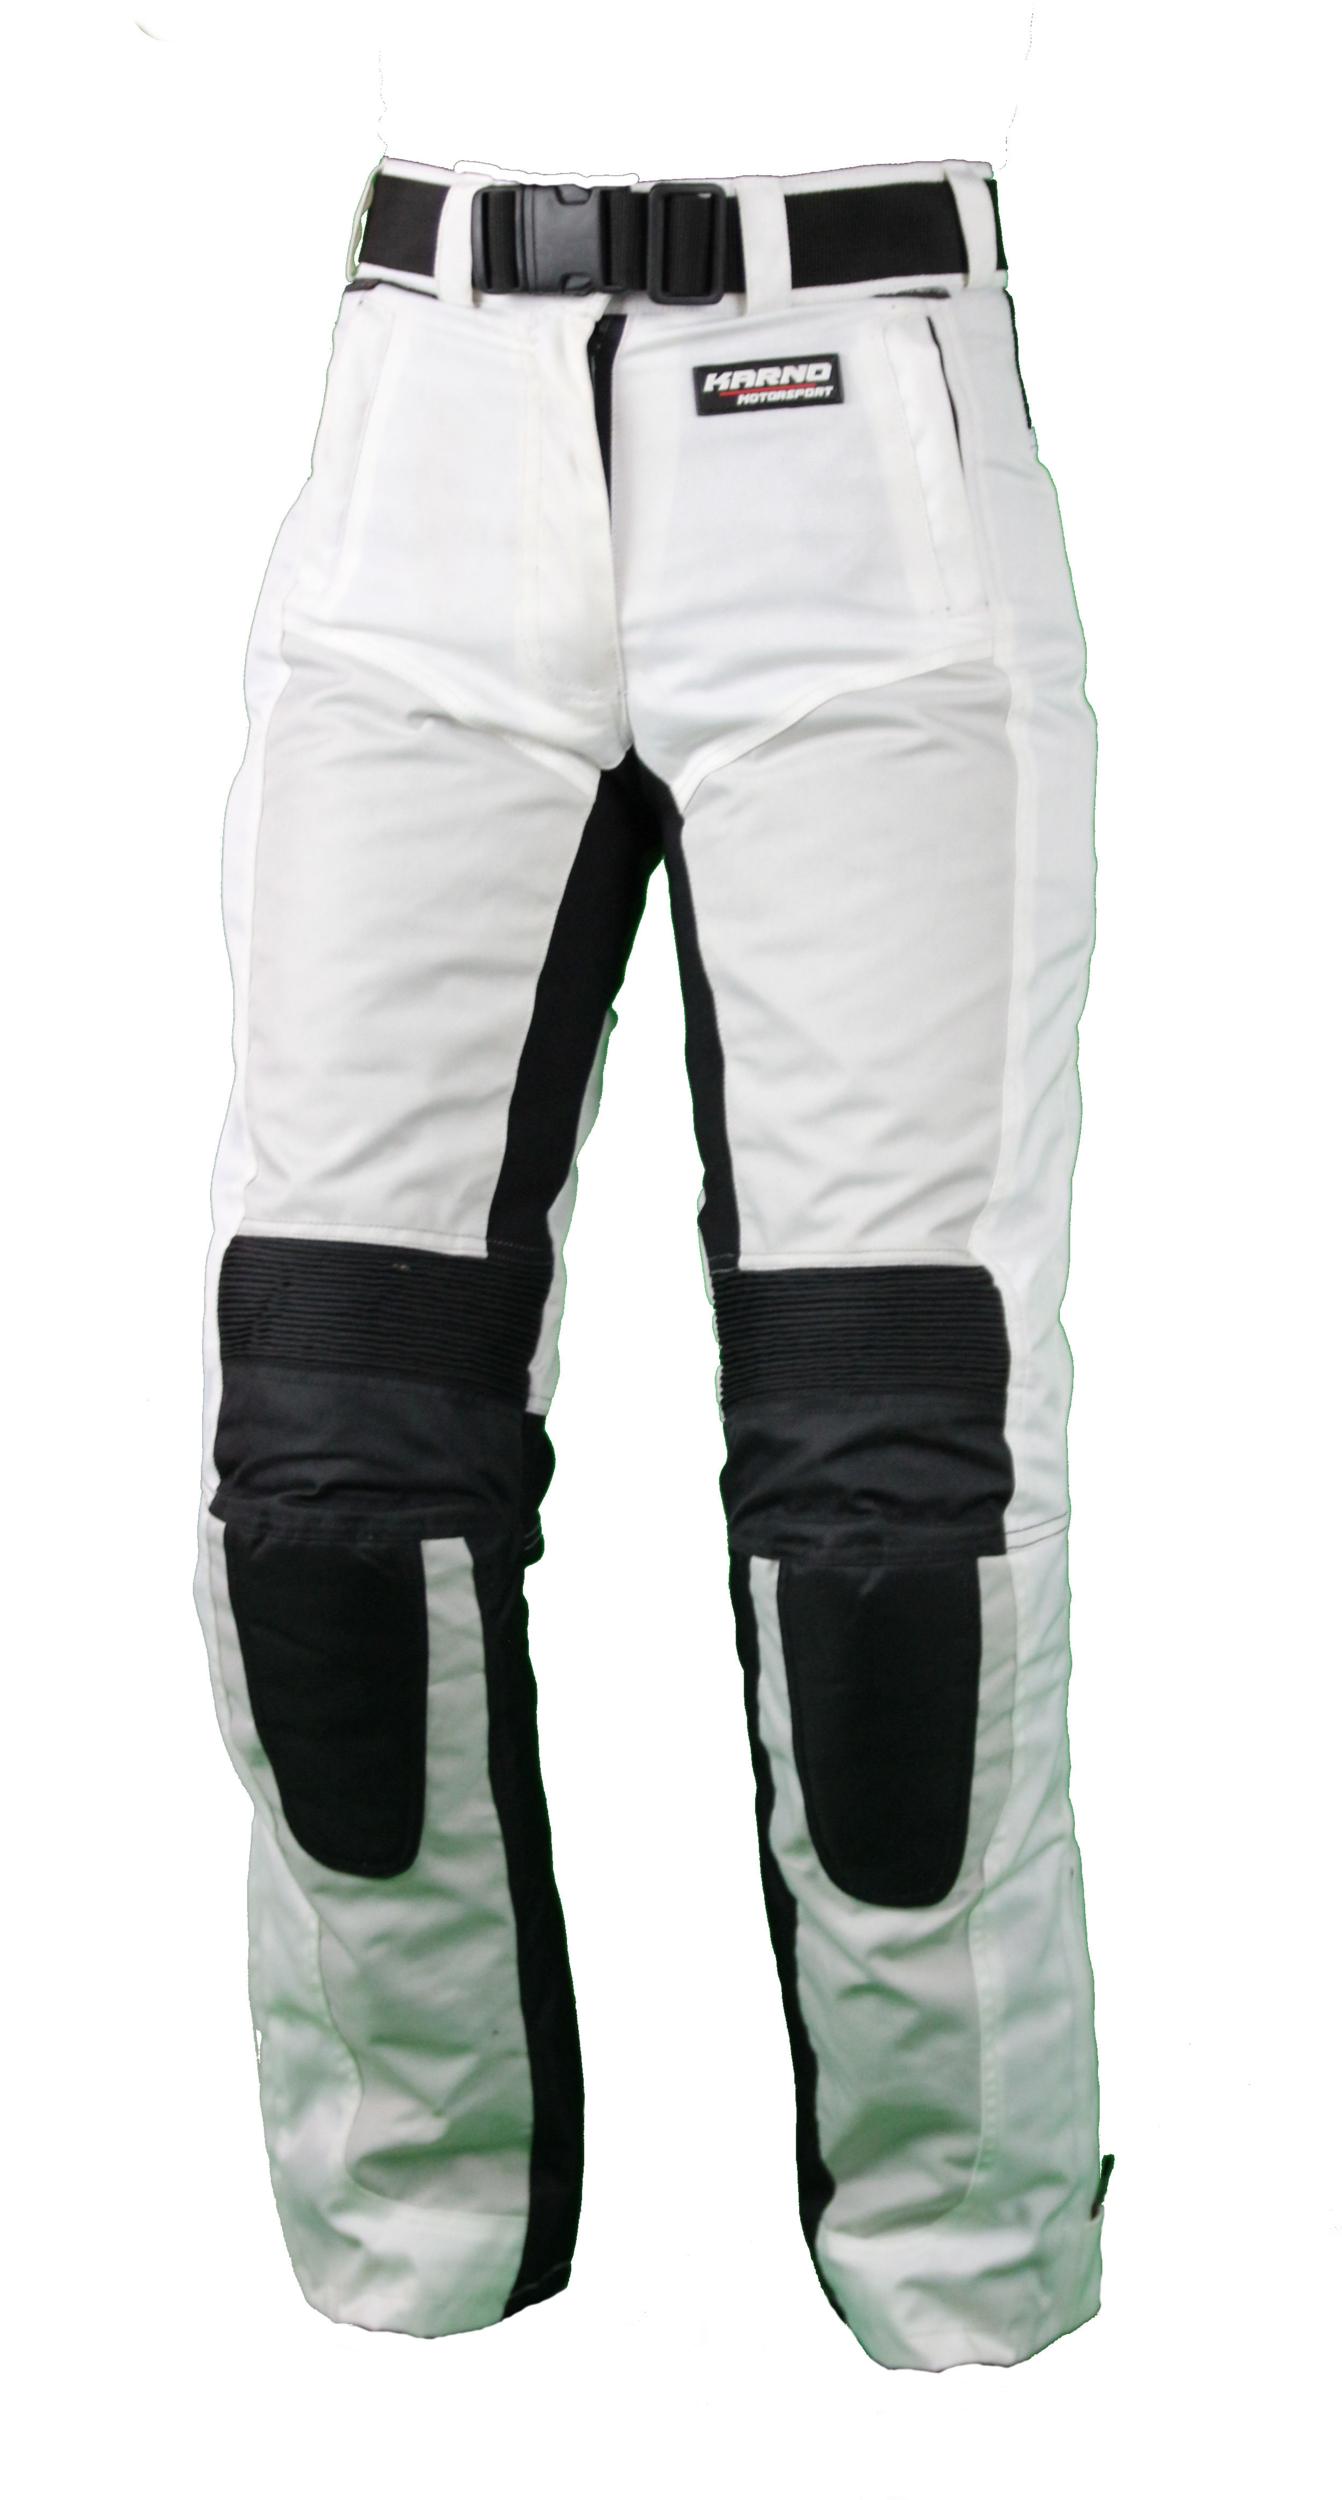 kt304 pantalon moto textile femme blanc karno white pearl pantalon pantalons femme textile. Black Bedroom Furniture Sets. Home Design Ideas